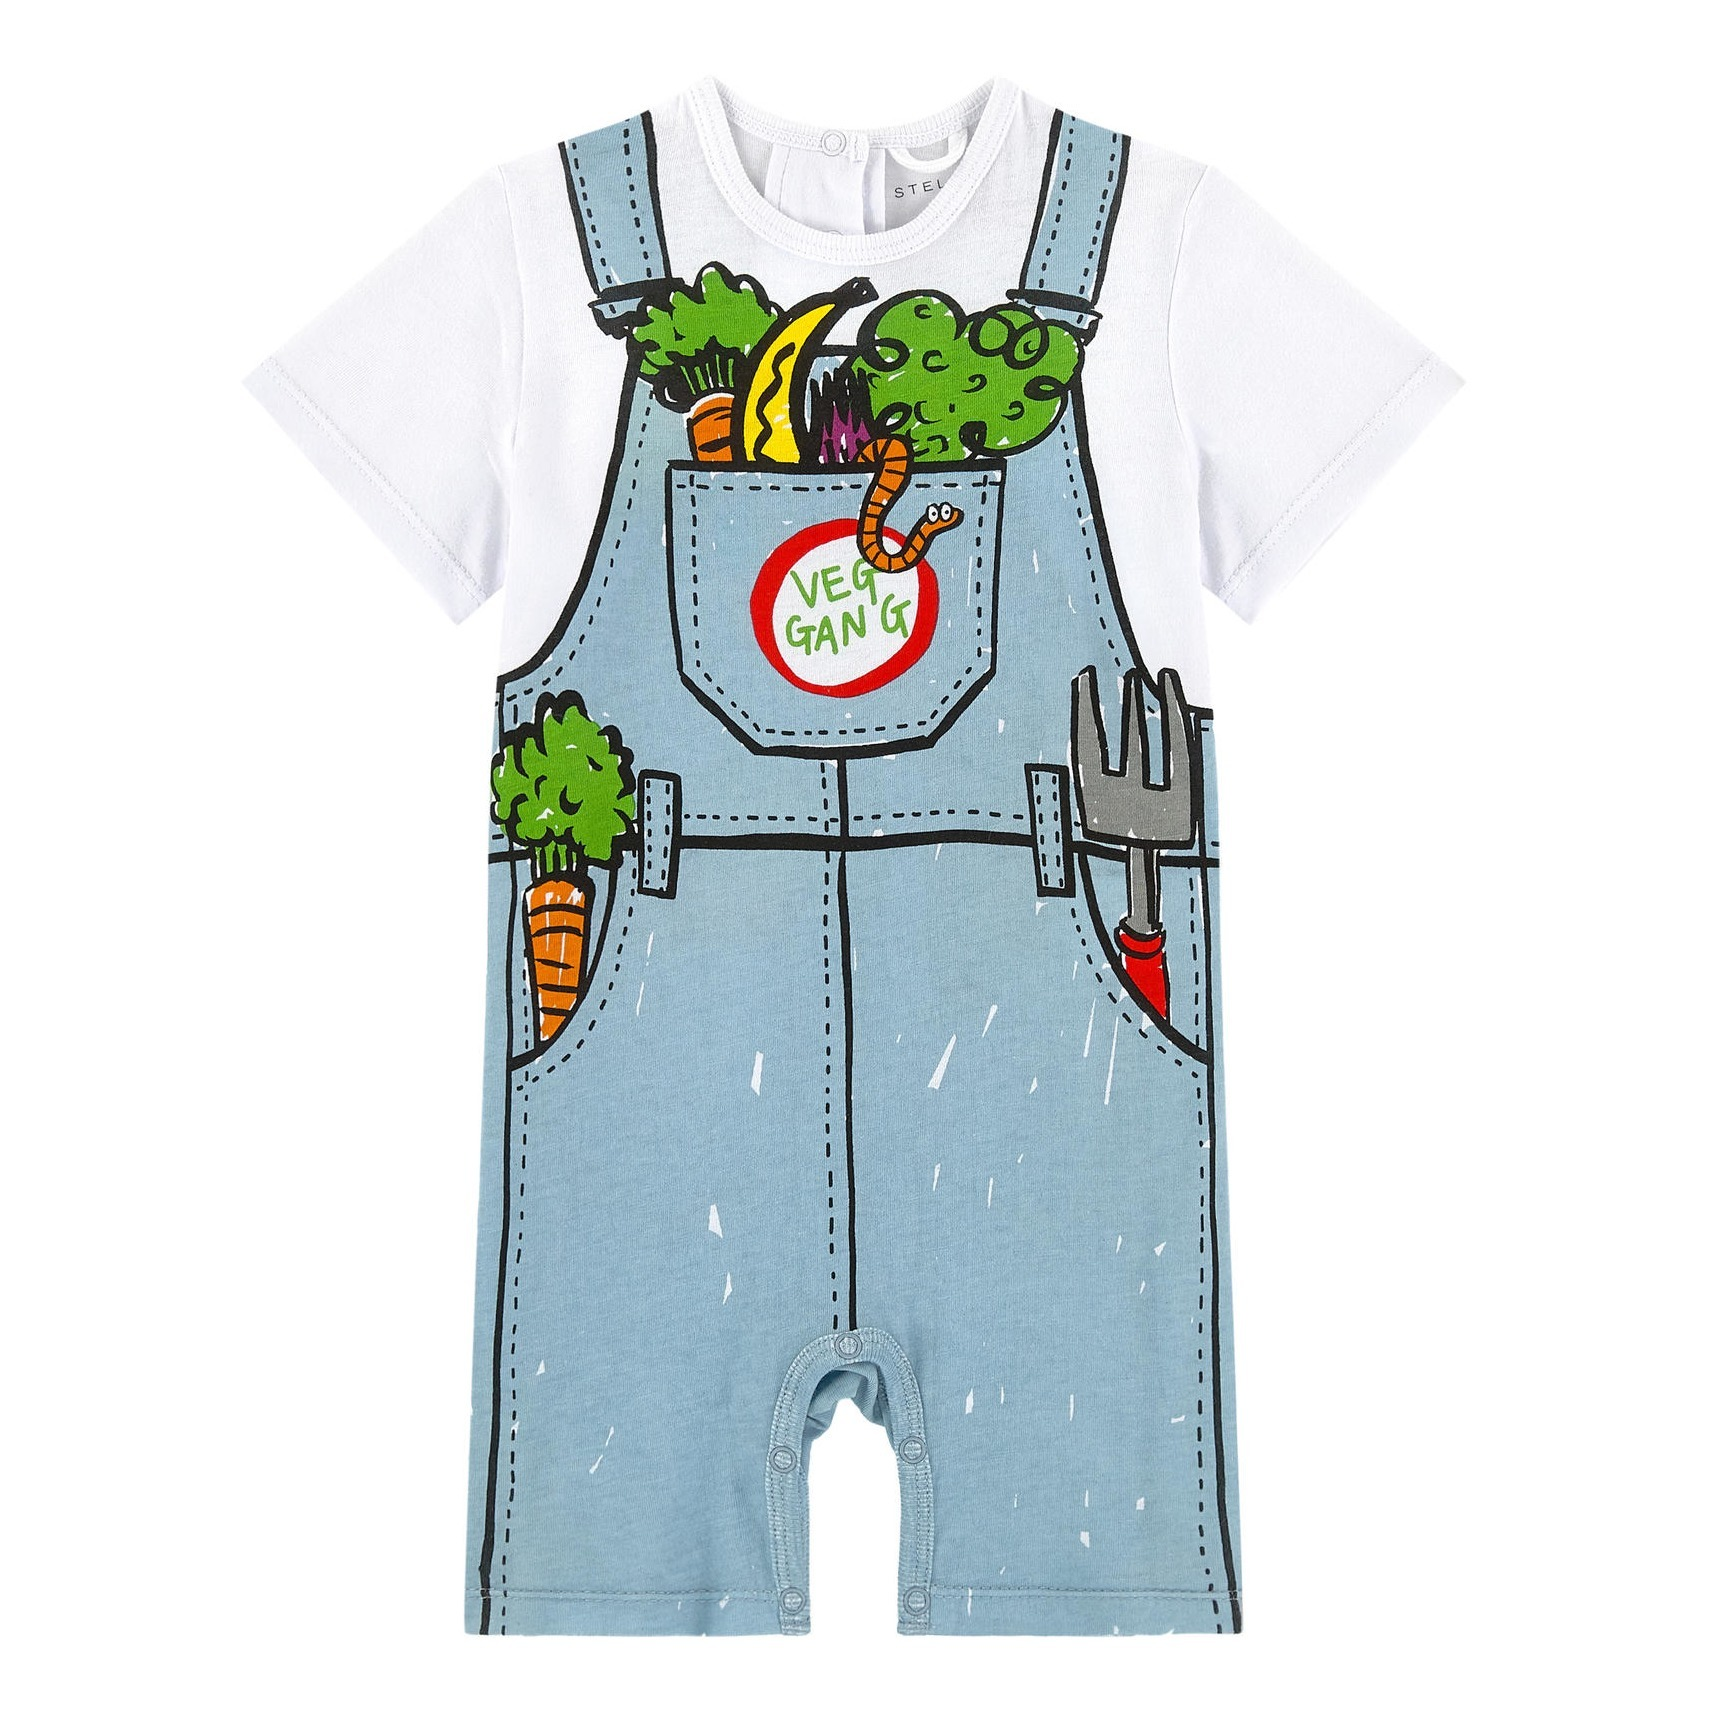 03b3a046246de Combishort Coton Bio Veg Gang Bleu Stella McCartney Kids Mode